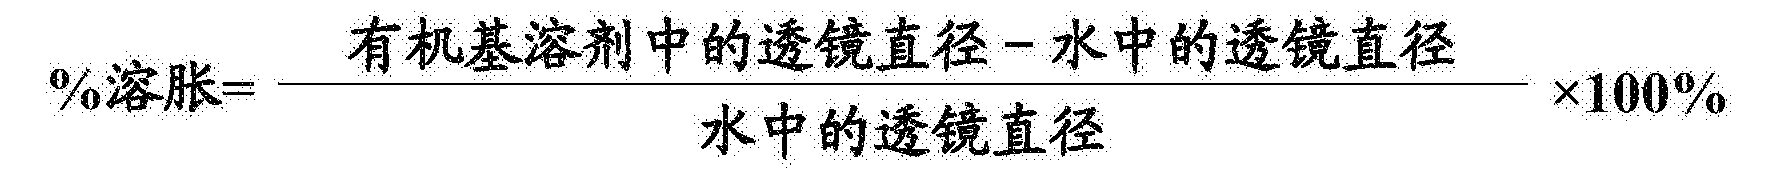 Figure CN106896422AD00131